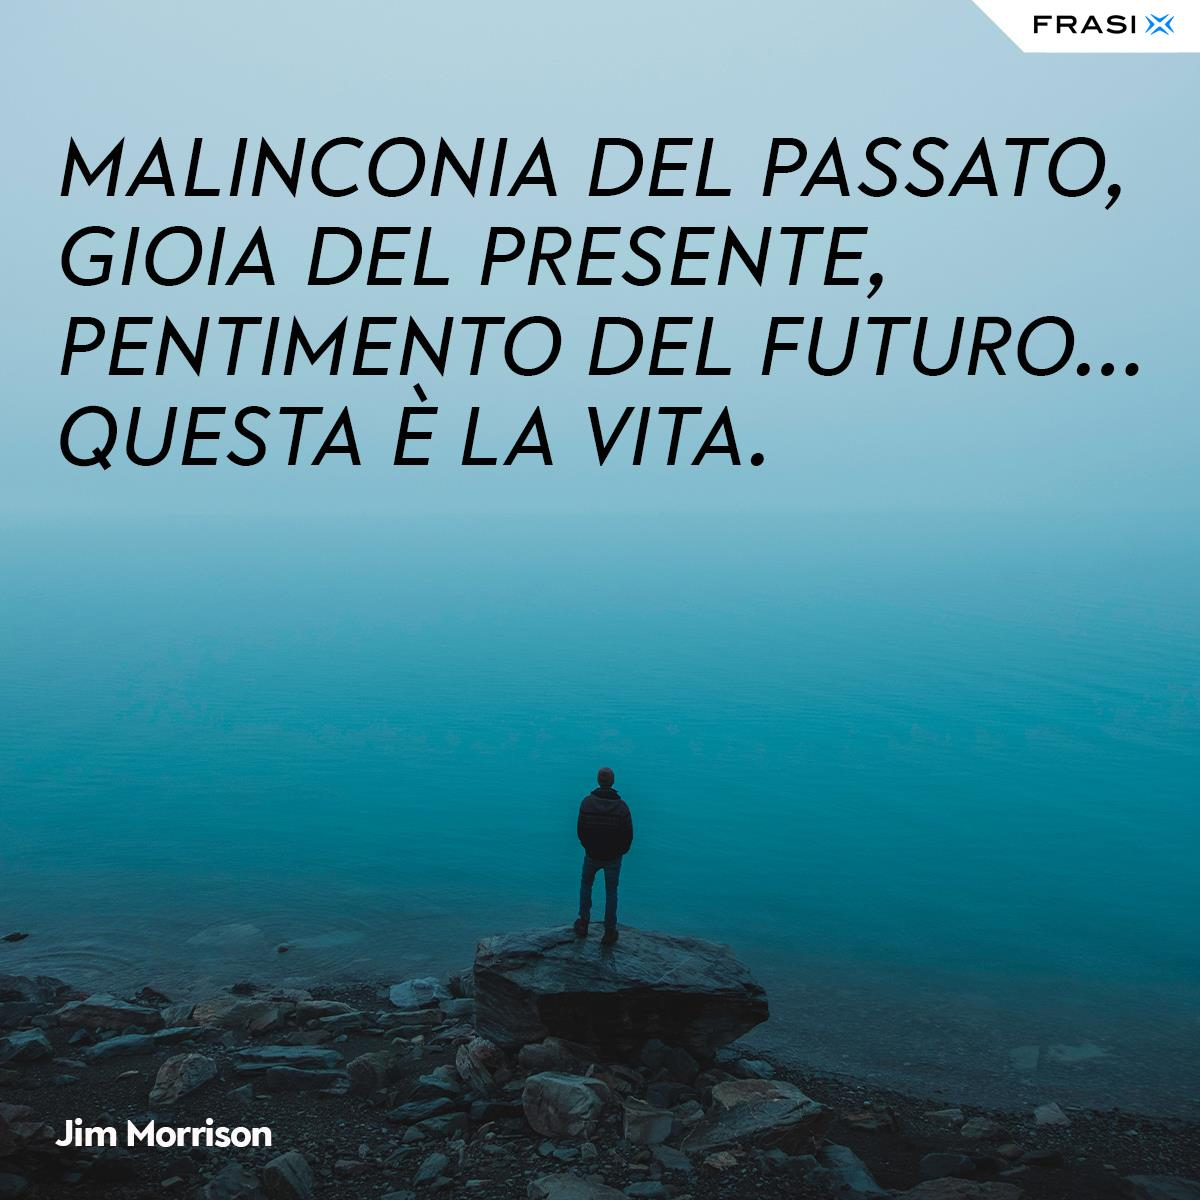 Frasi depresse vita Jim Morrison